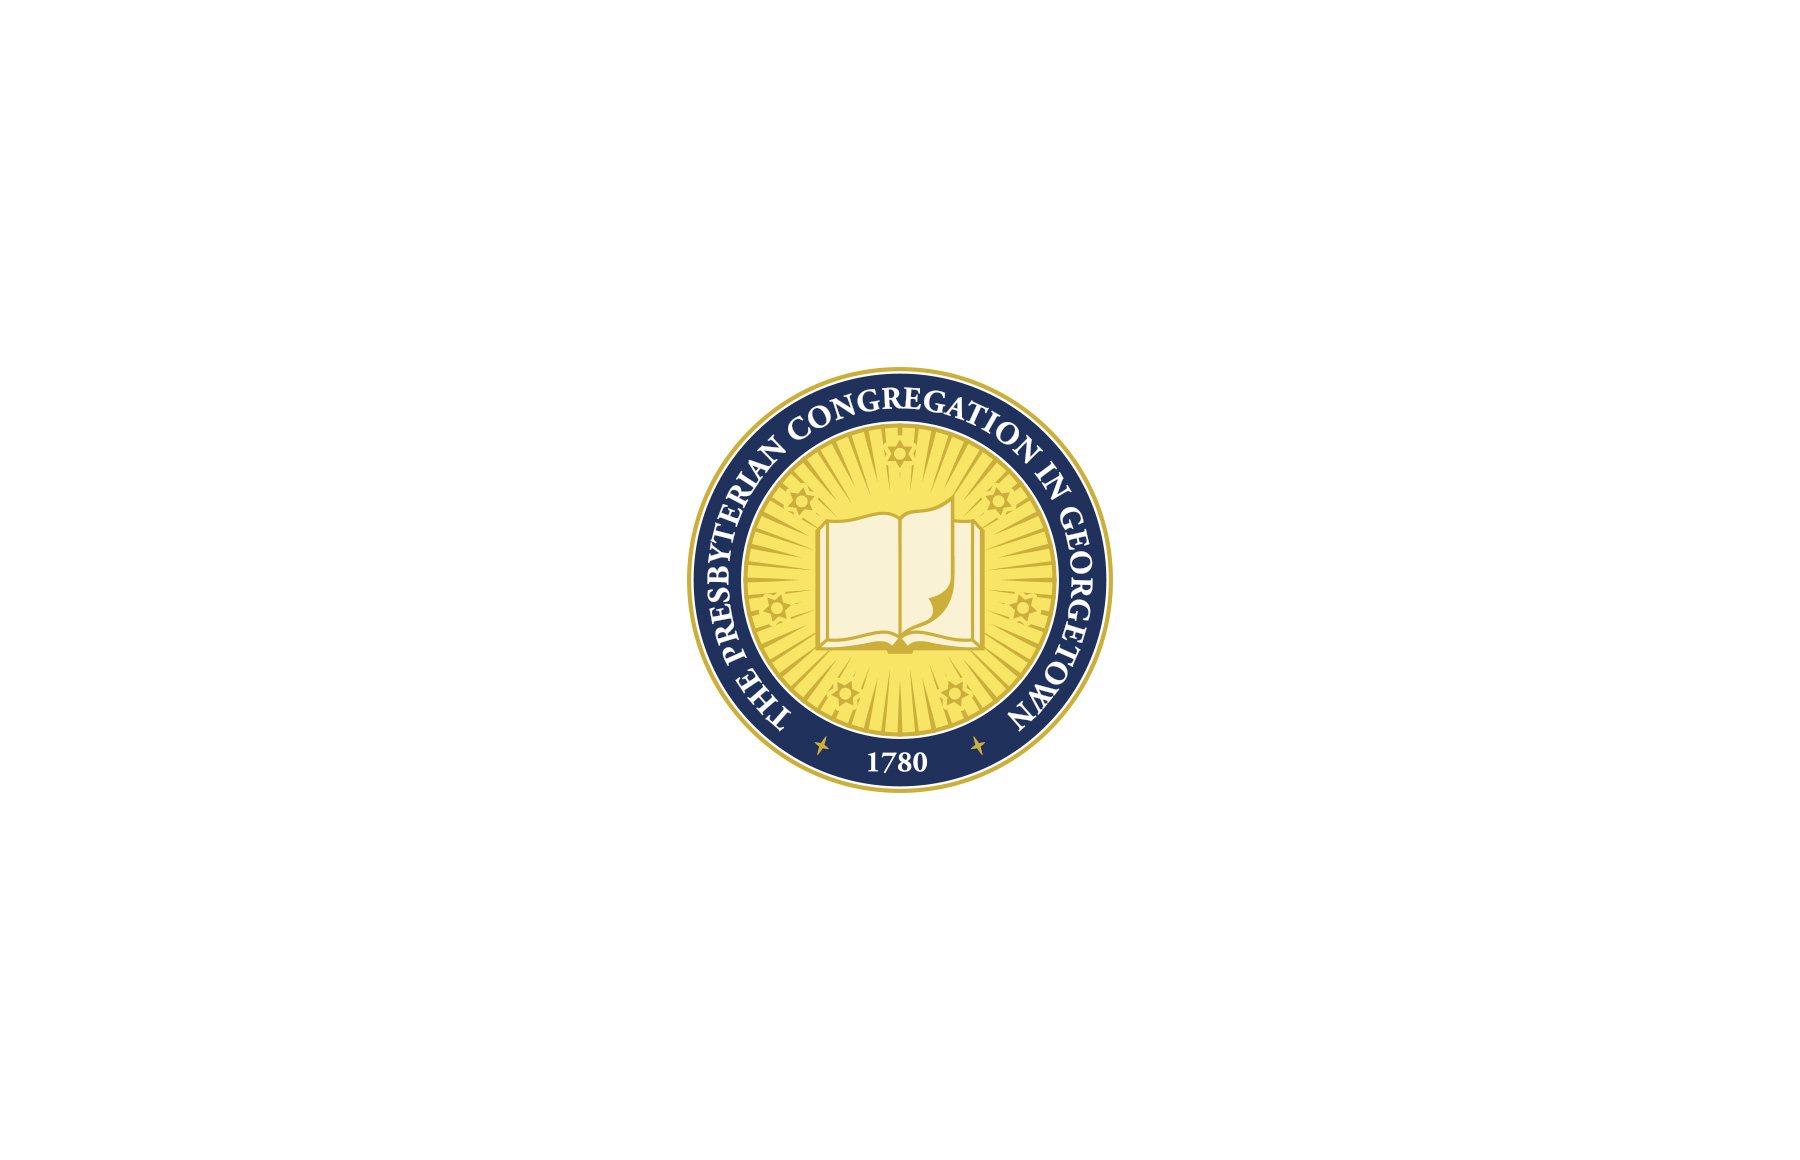 berman_brand_group_joshua_berman_brand_identity_logo_gpc_seal.jpg